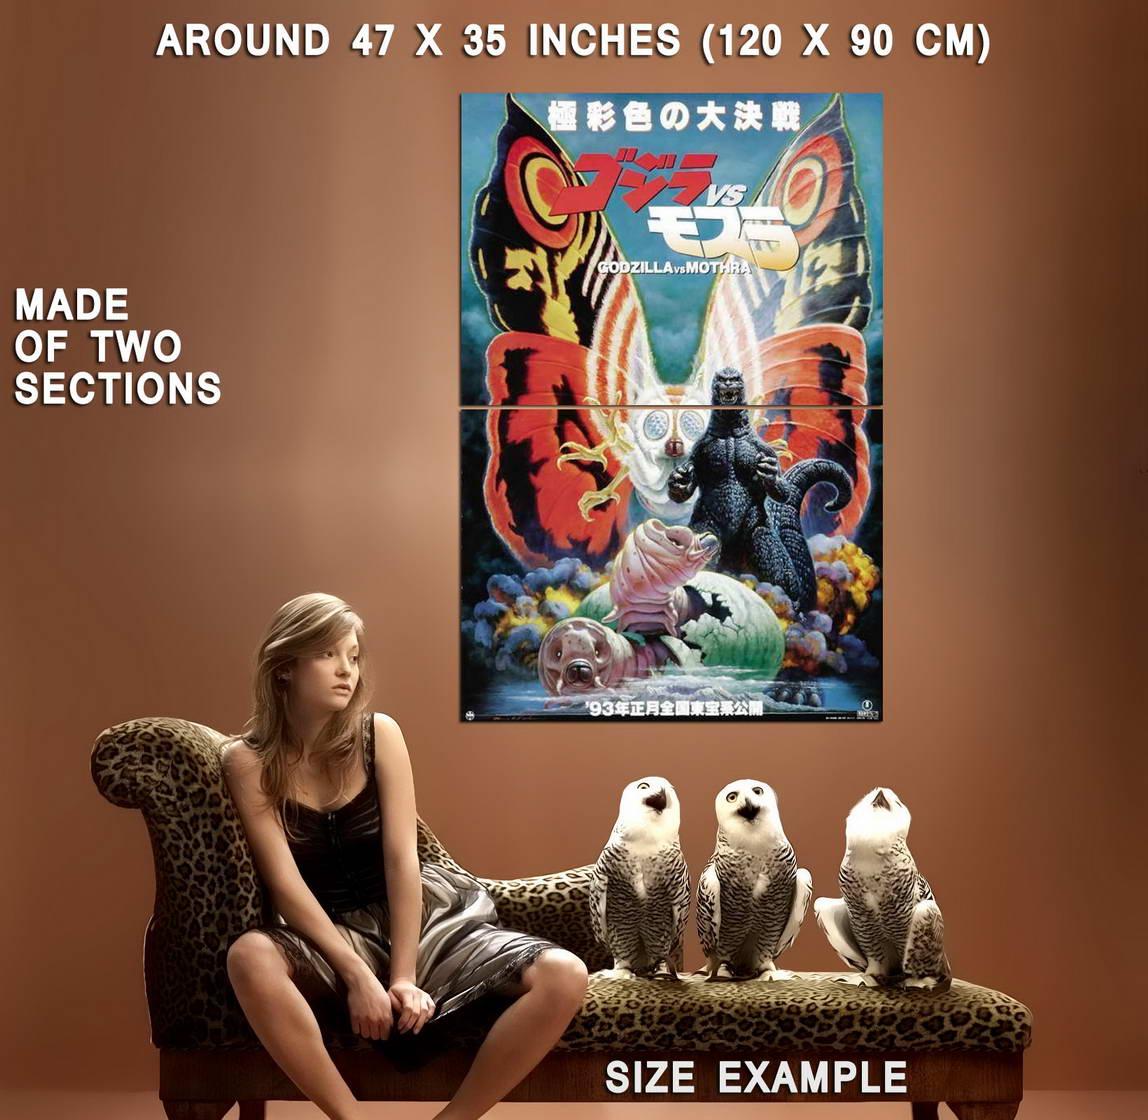 65819-Mothra-vs-Godzilla-Movie-Akira-Takarada-Wall-Print-Poster-Affiche